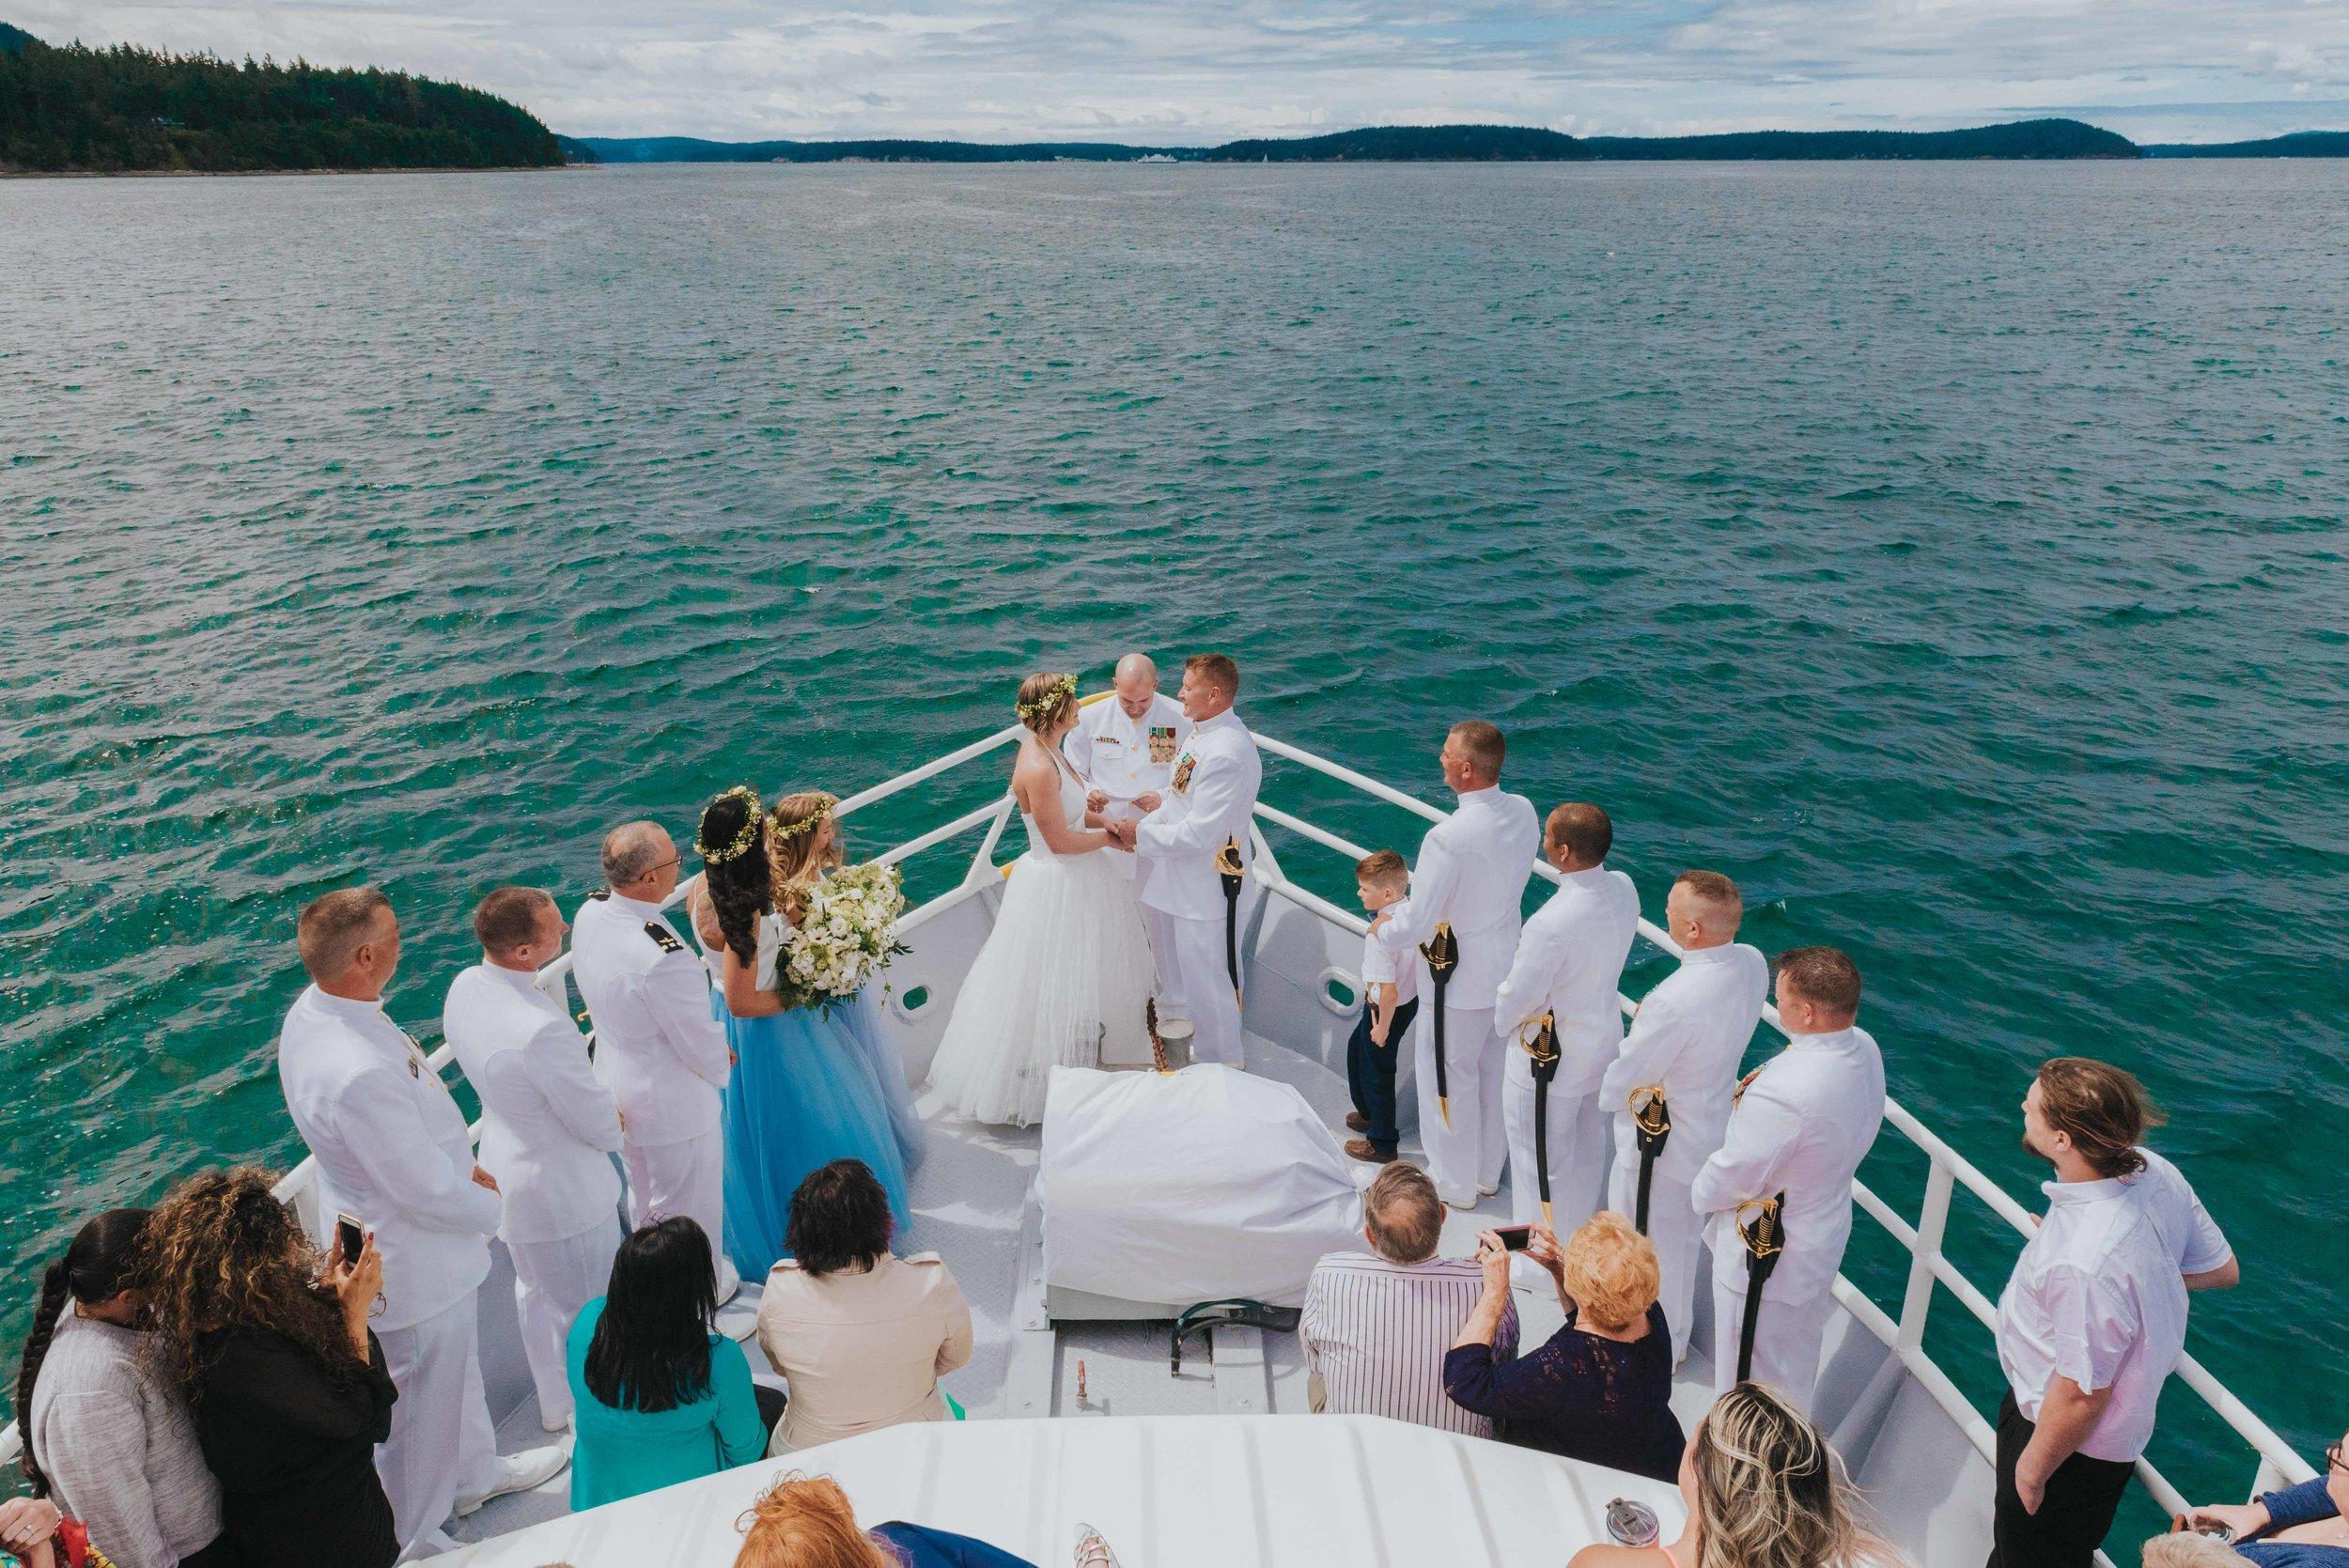 SSPNW-Wedding-Photographer (1 of 4).jpg